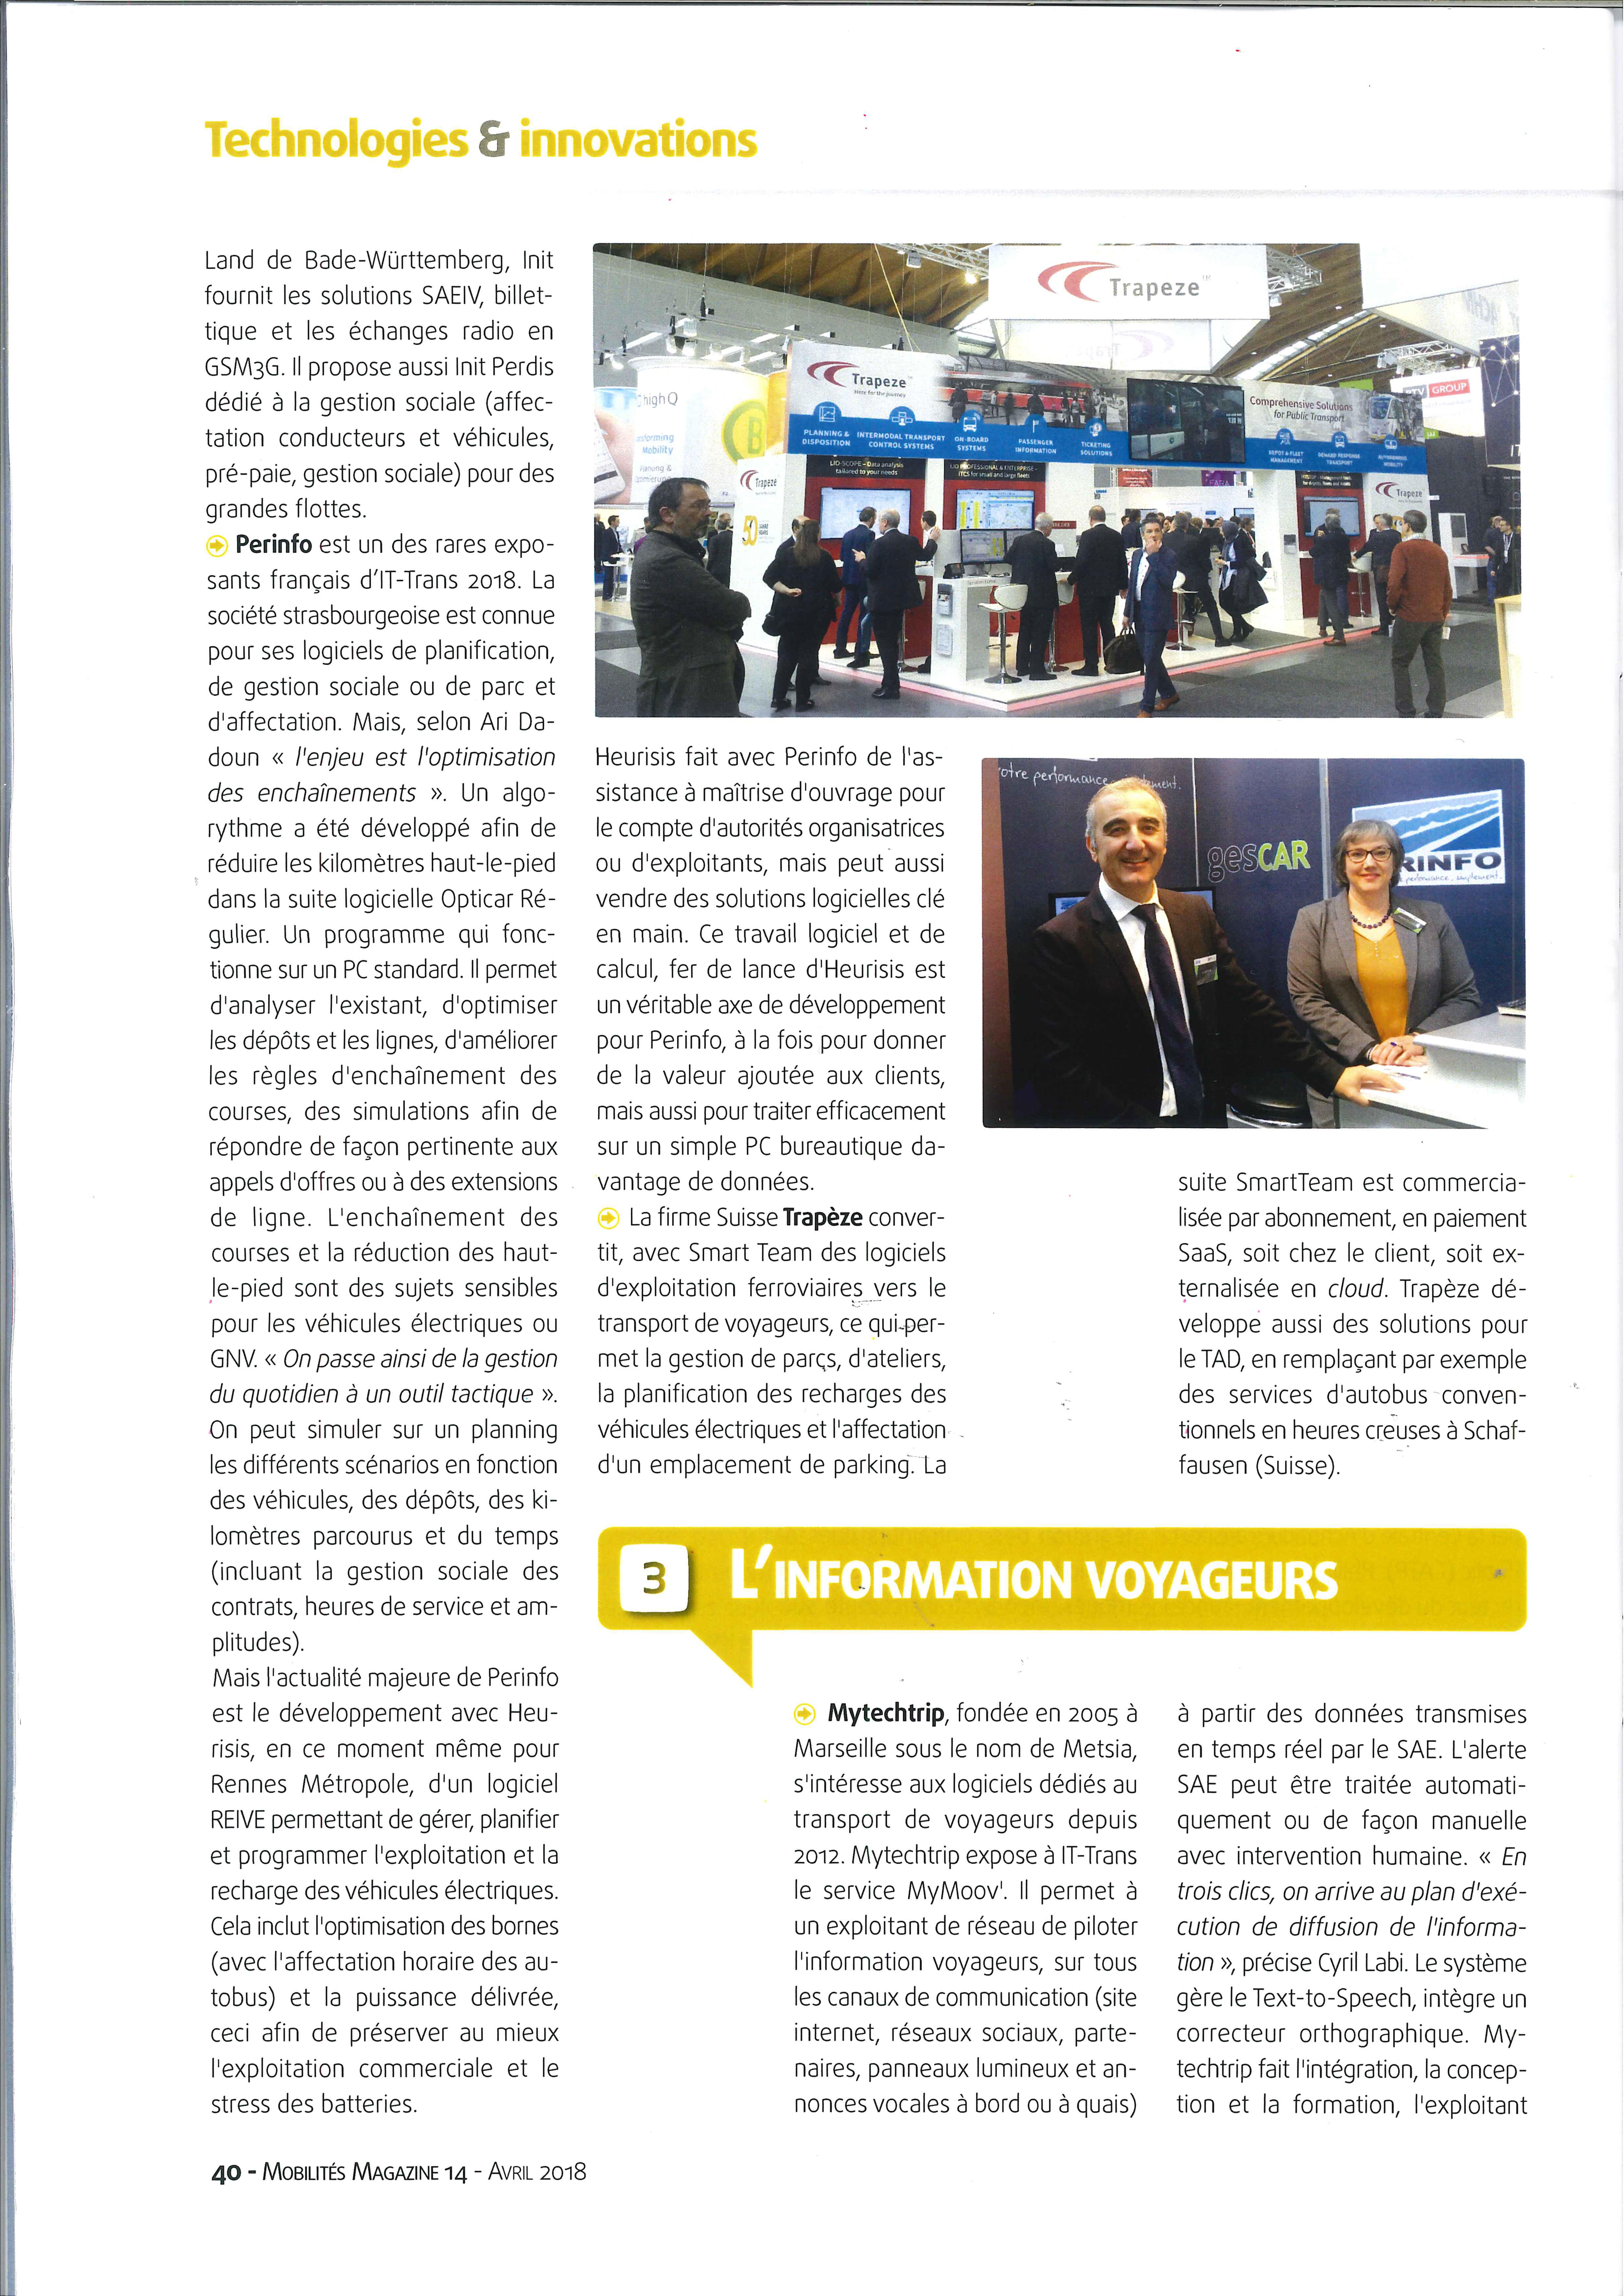 Mobilité Magazine n°14